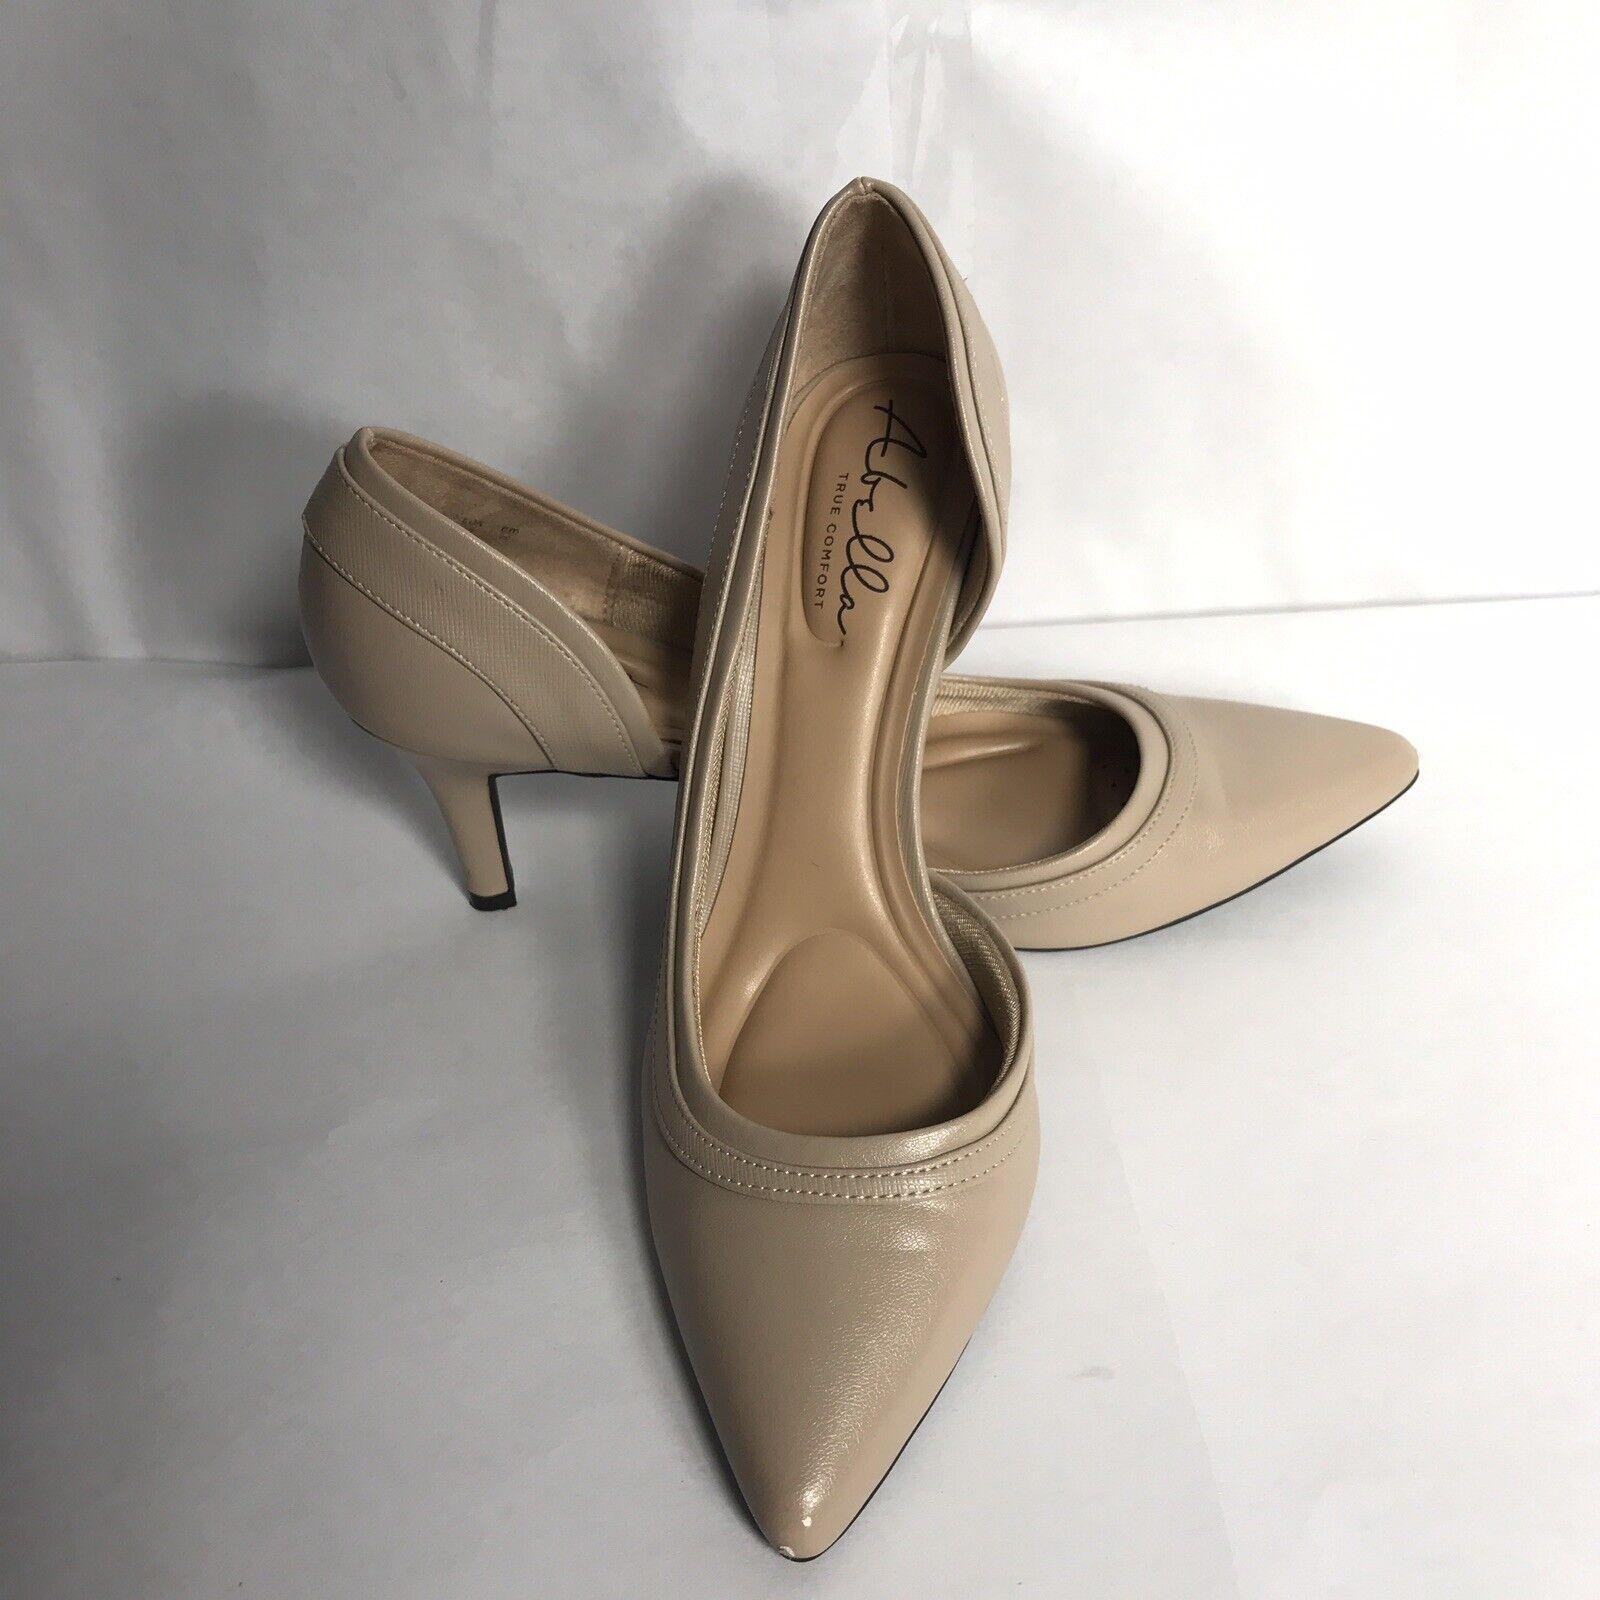 "abella true comfort 9M beige natural pumps pointed toe 3"" heel slip on women's"